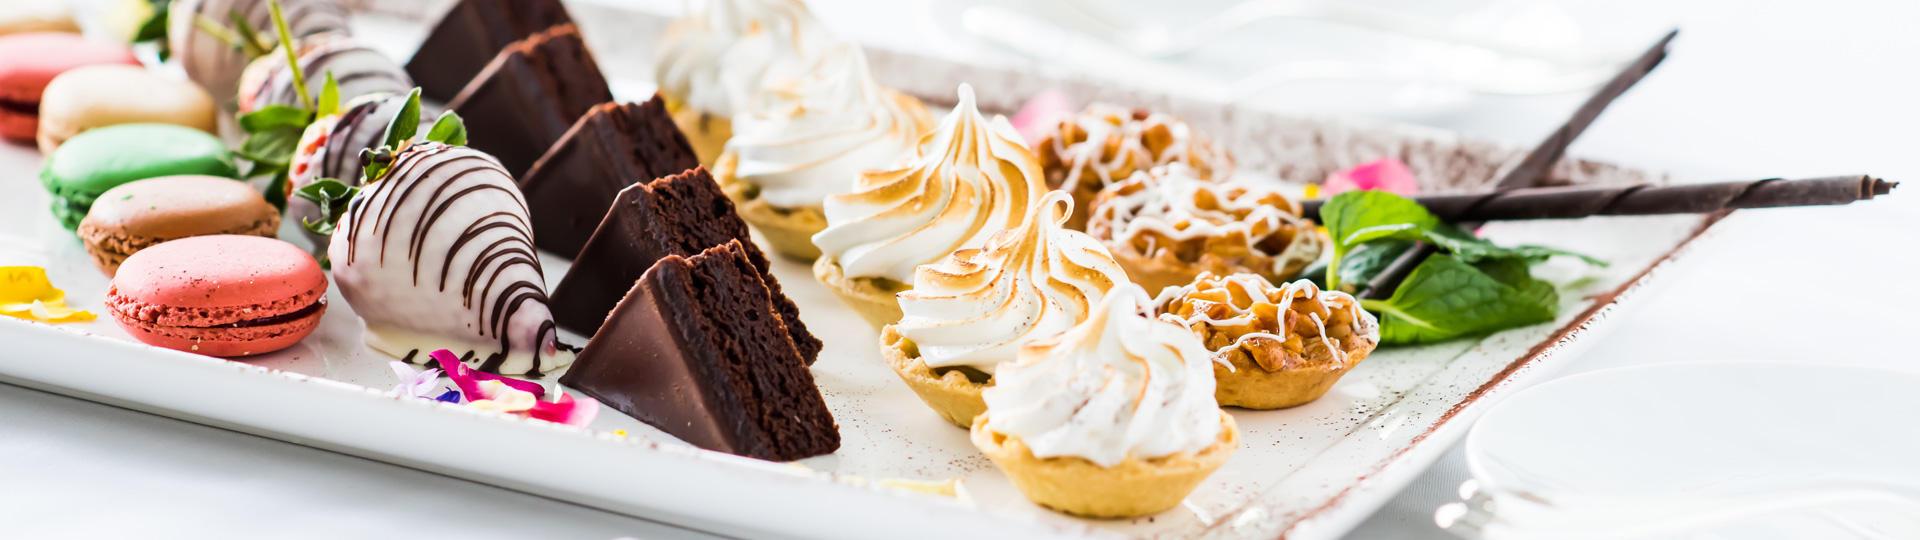 Various desserts arranges on a platter